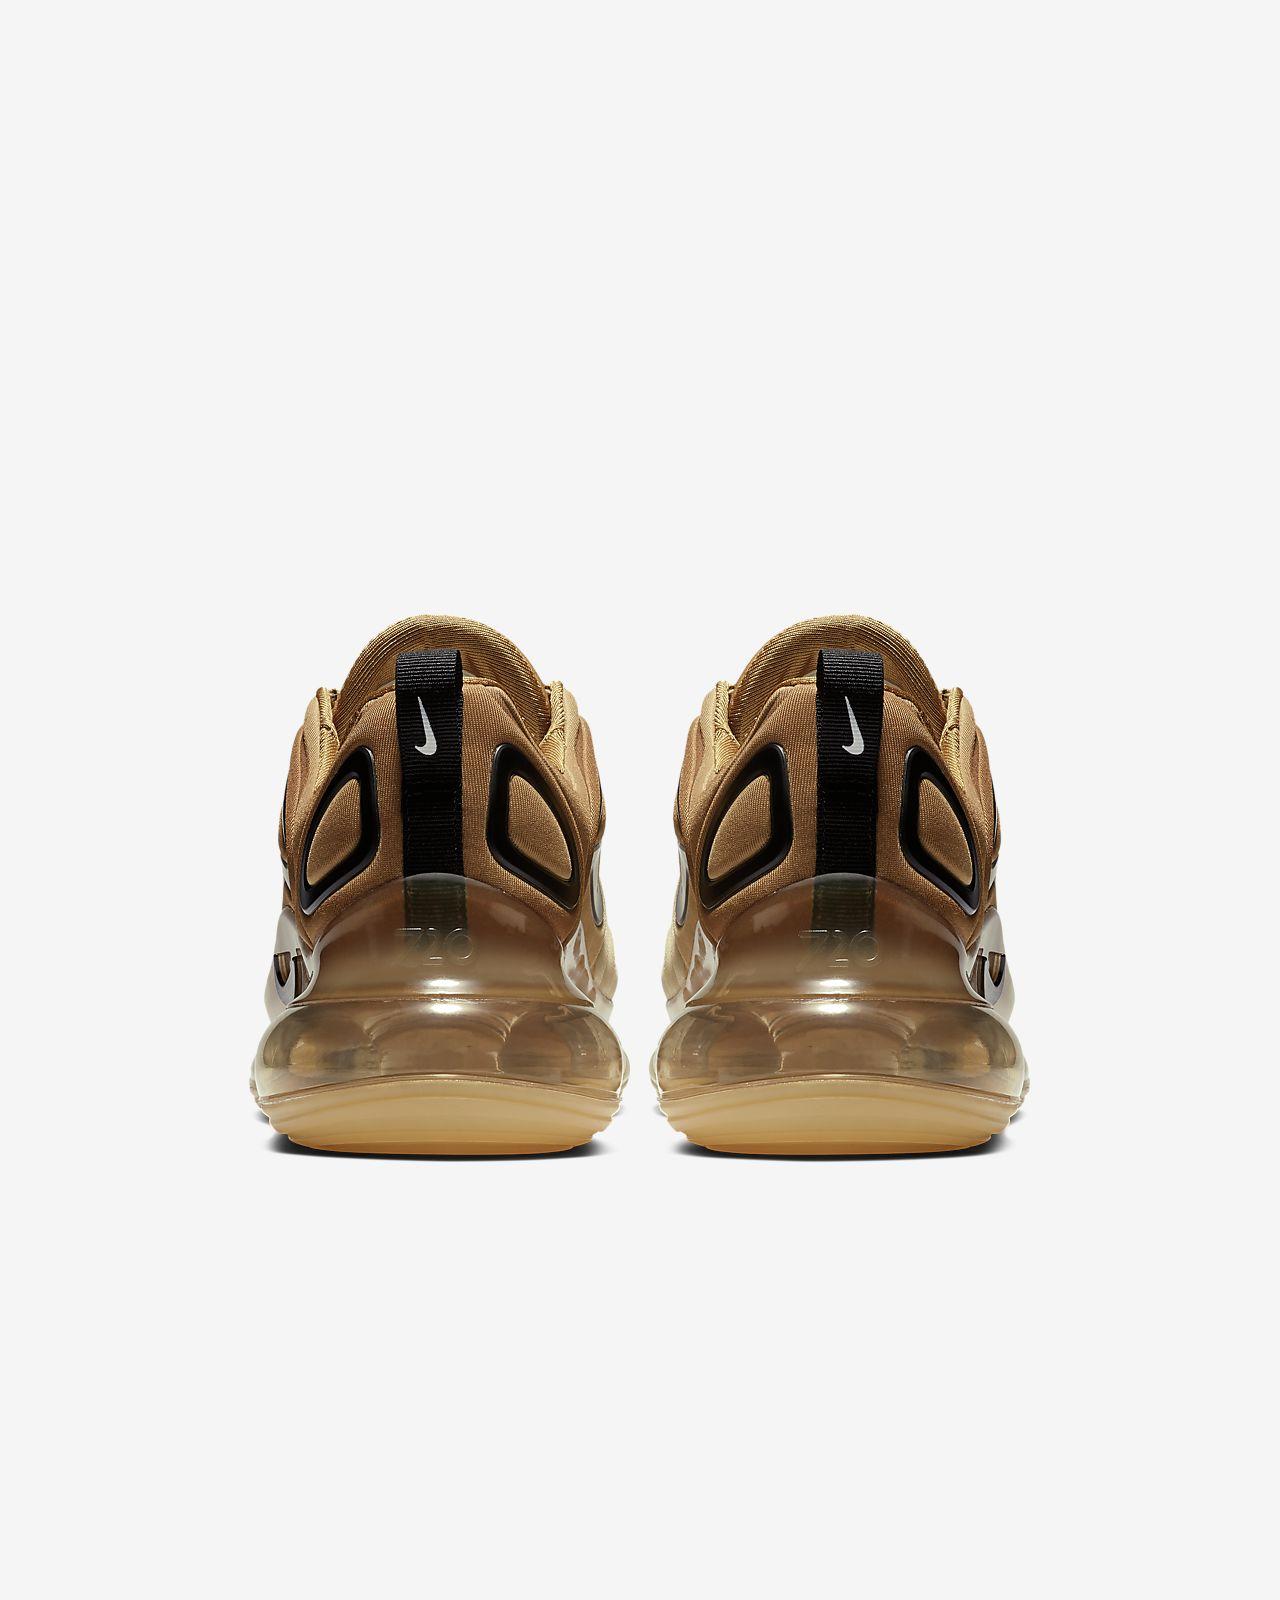 promo code 2317f 5b343 ... Chaussure Nike Air Max 720 pour Femme